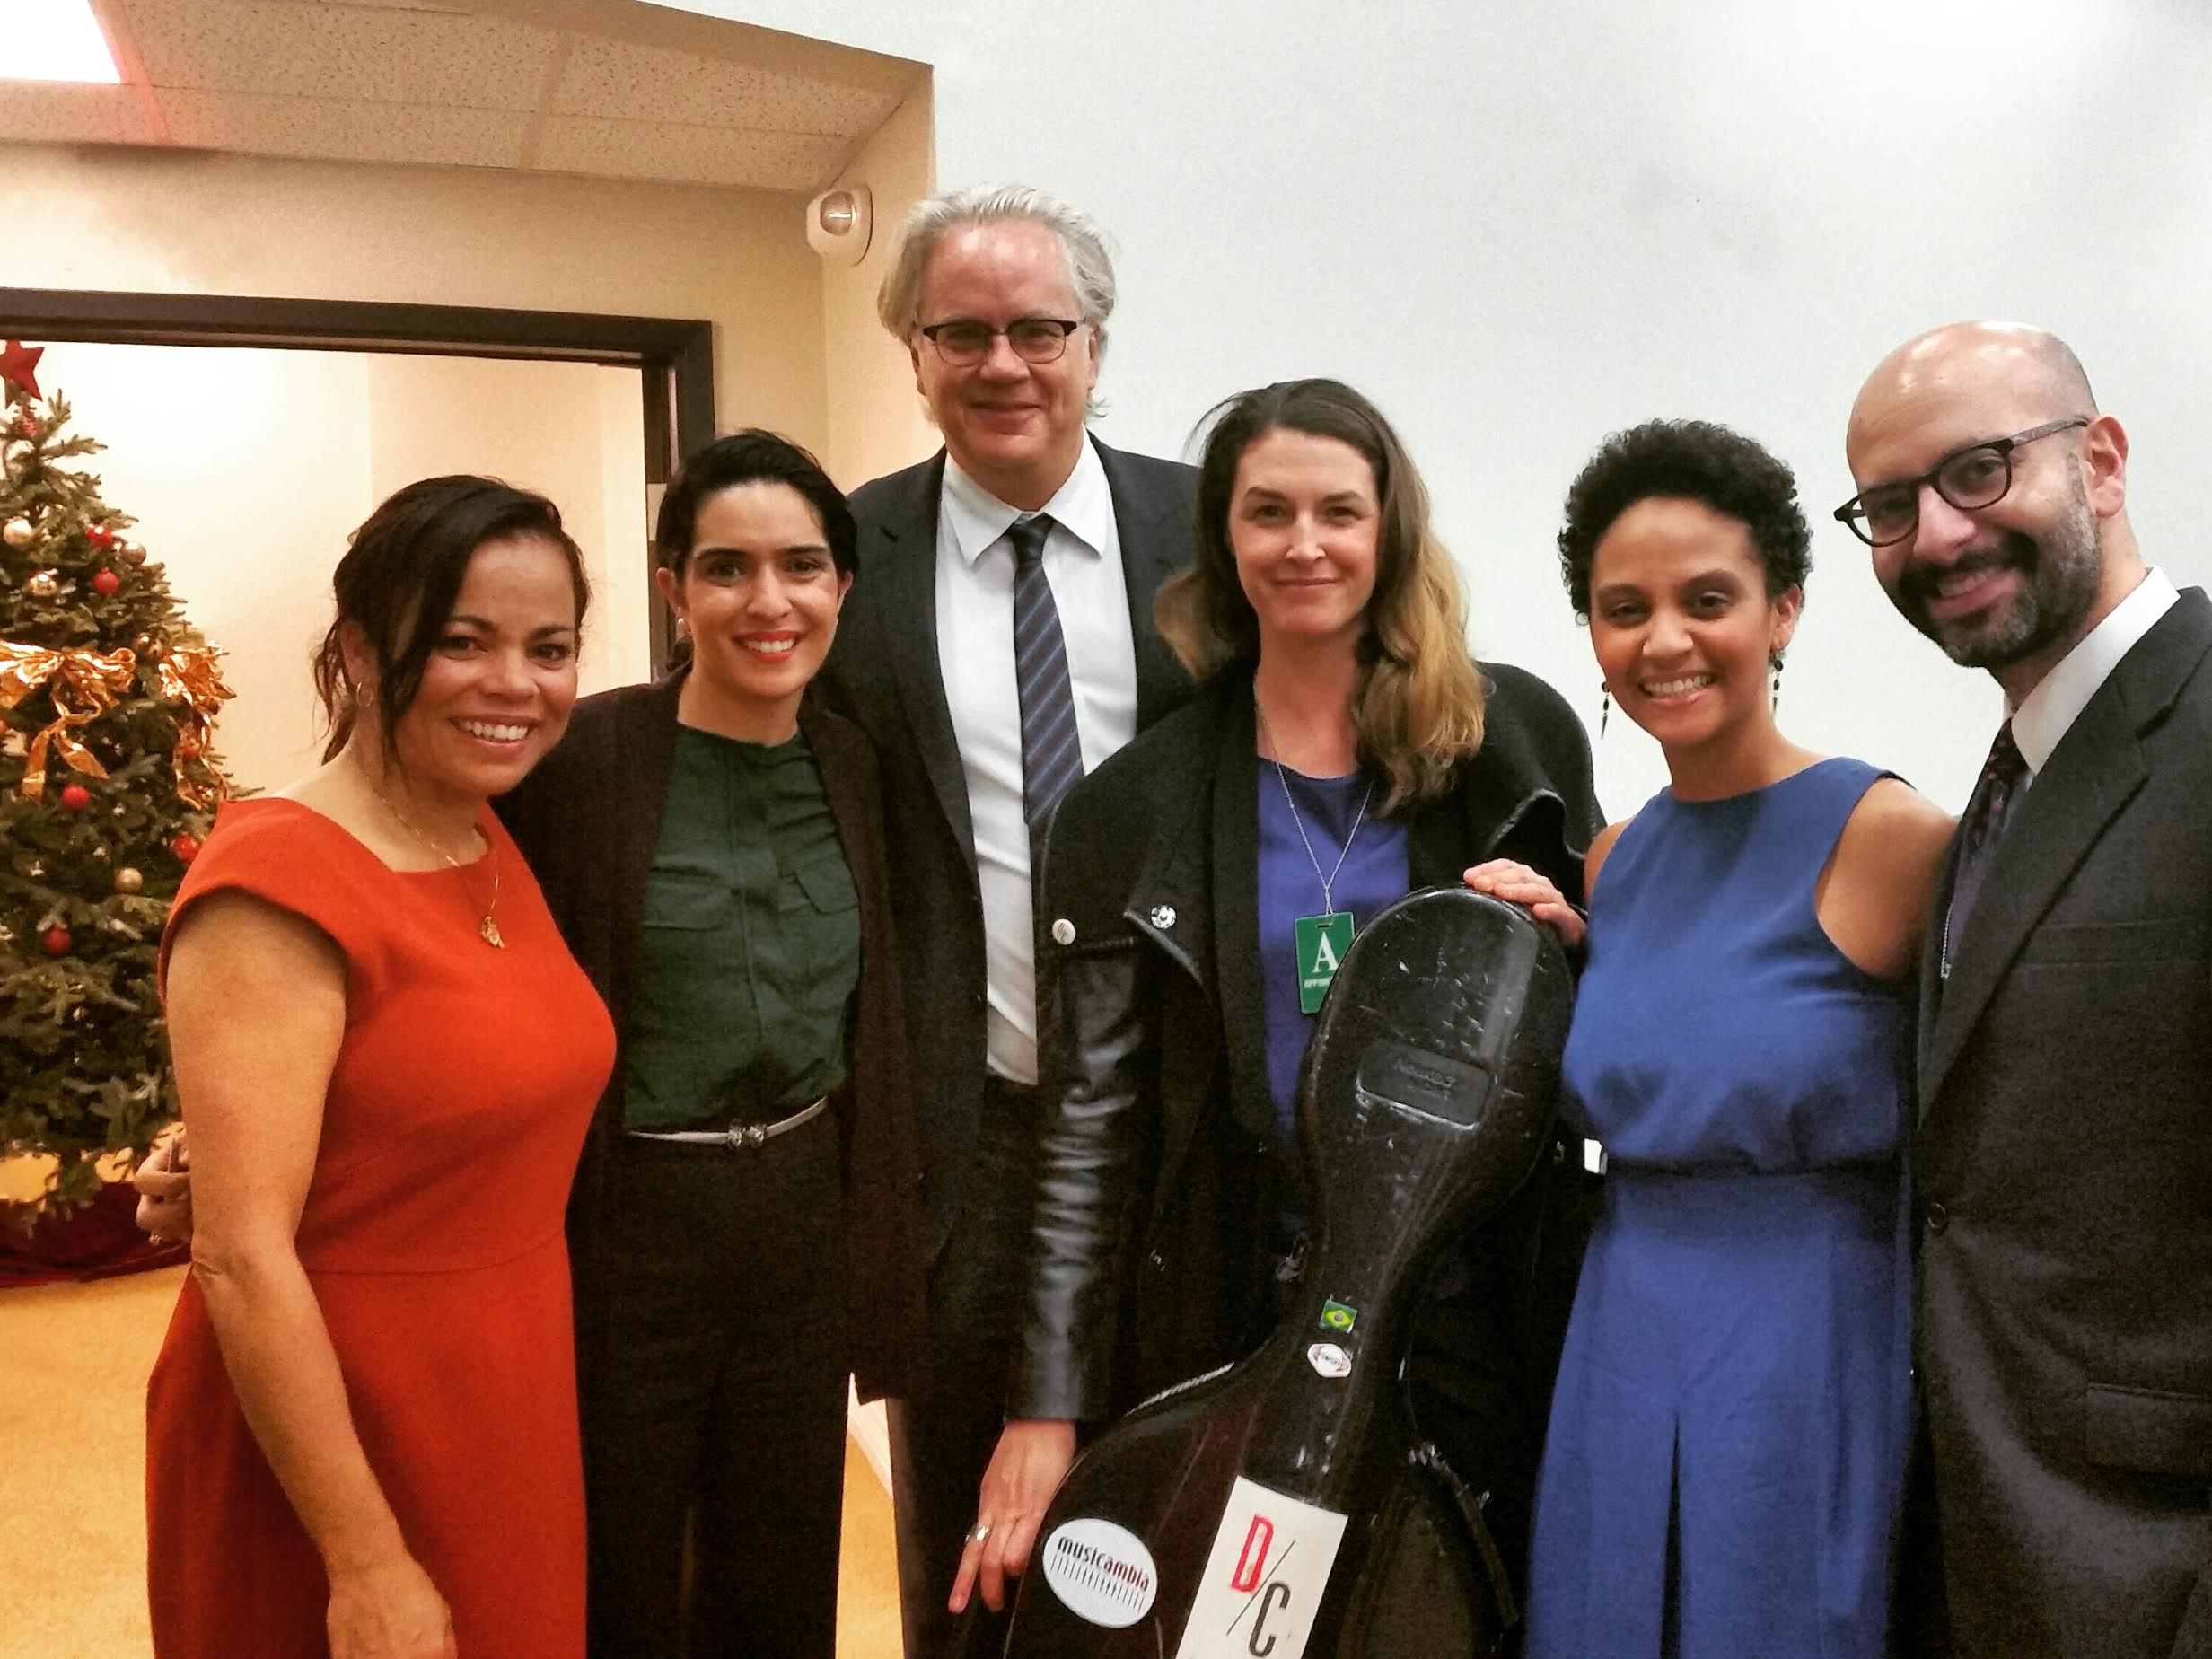 Sabra Williams, Meena Bhasin, Tim Robbins, Claire Bryant, Sarah Elizabeth Charles, John Marcus